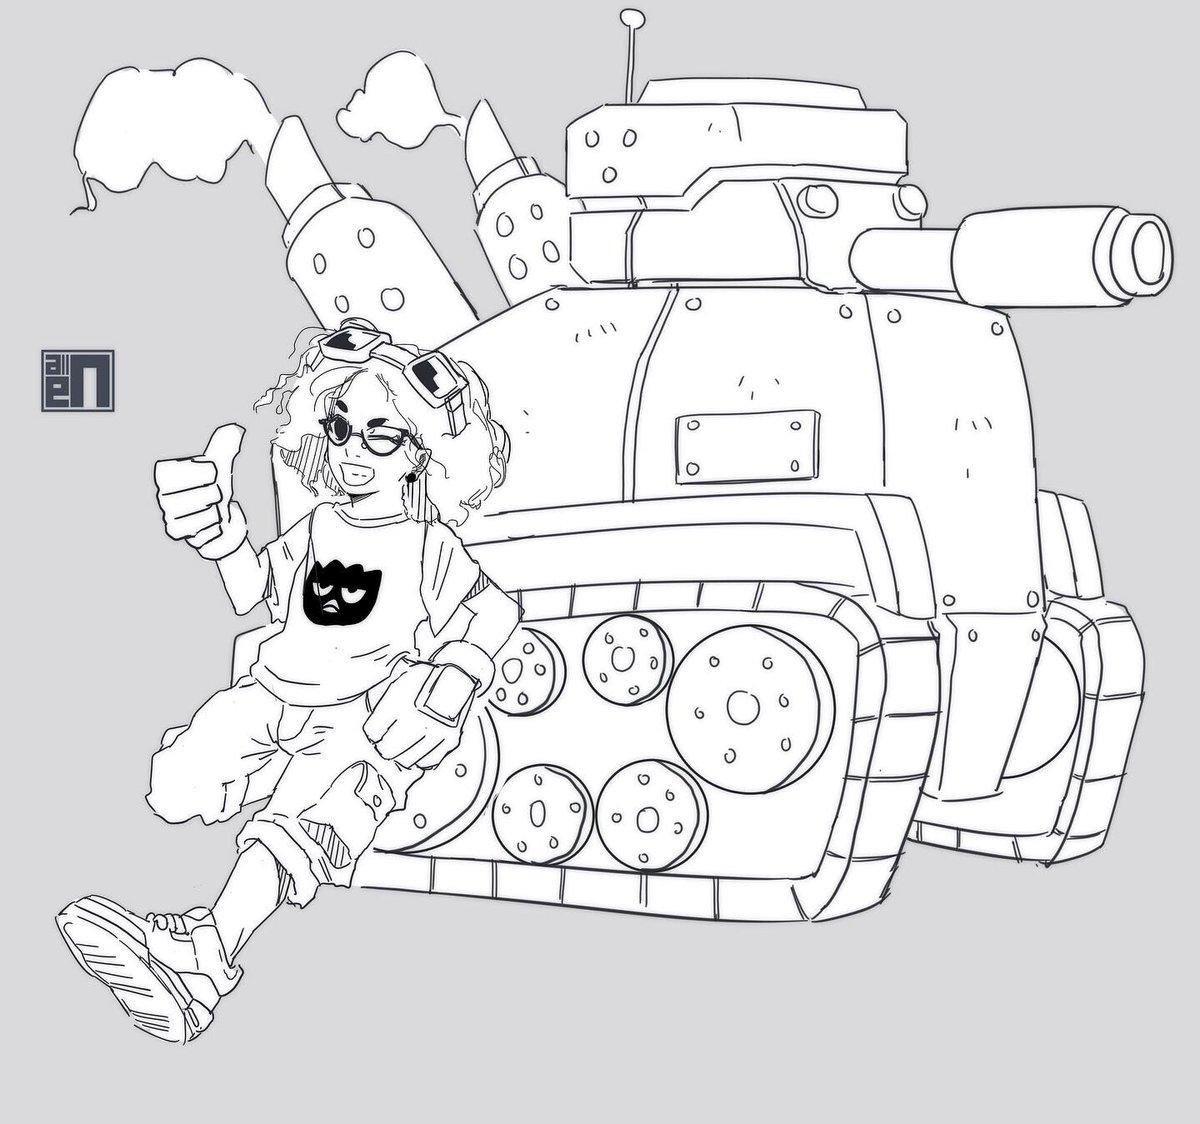 Line work w.i.p of my oc Gi Gi  #art #illustration #drawing #sketch #doodle #digitalart #digitalillustration #digitaldrawing #digitalsketch #manga #mangaart #anime #animeart #originalcharacter #oc #tank #characterdesign #tankgirl #blackanimecharacters #blackmangacharacterspic.twitter.com/ImFemFtUUX